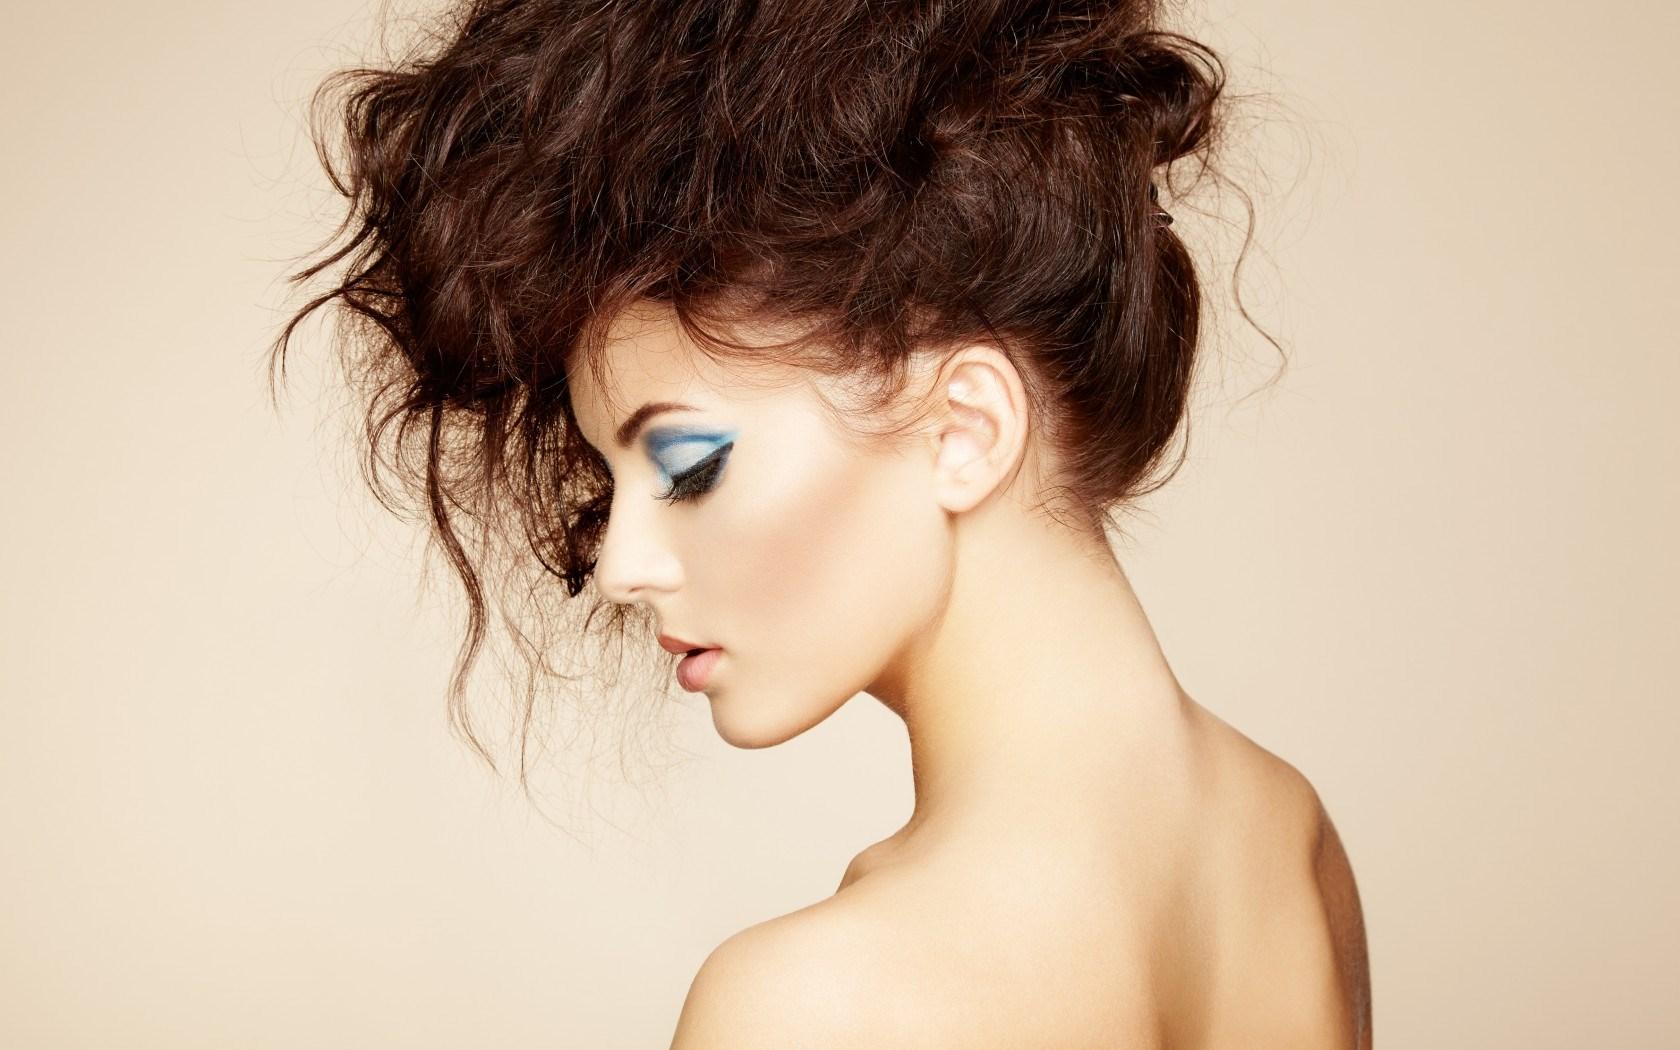 photoshop打造美女与风景双重曝光效果